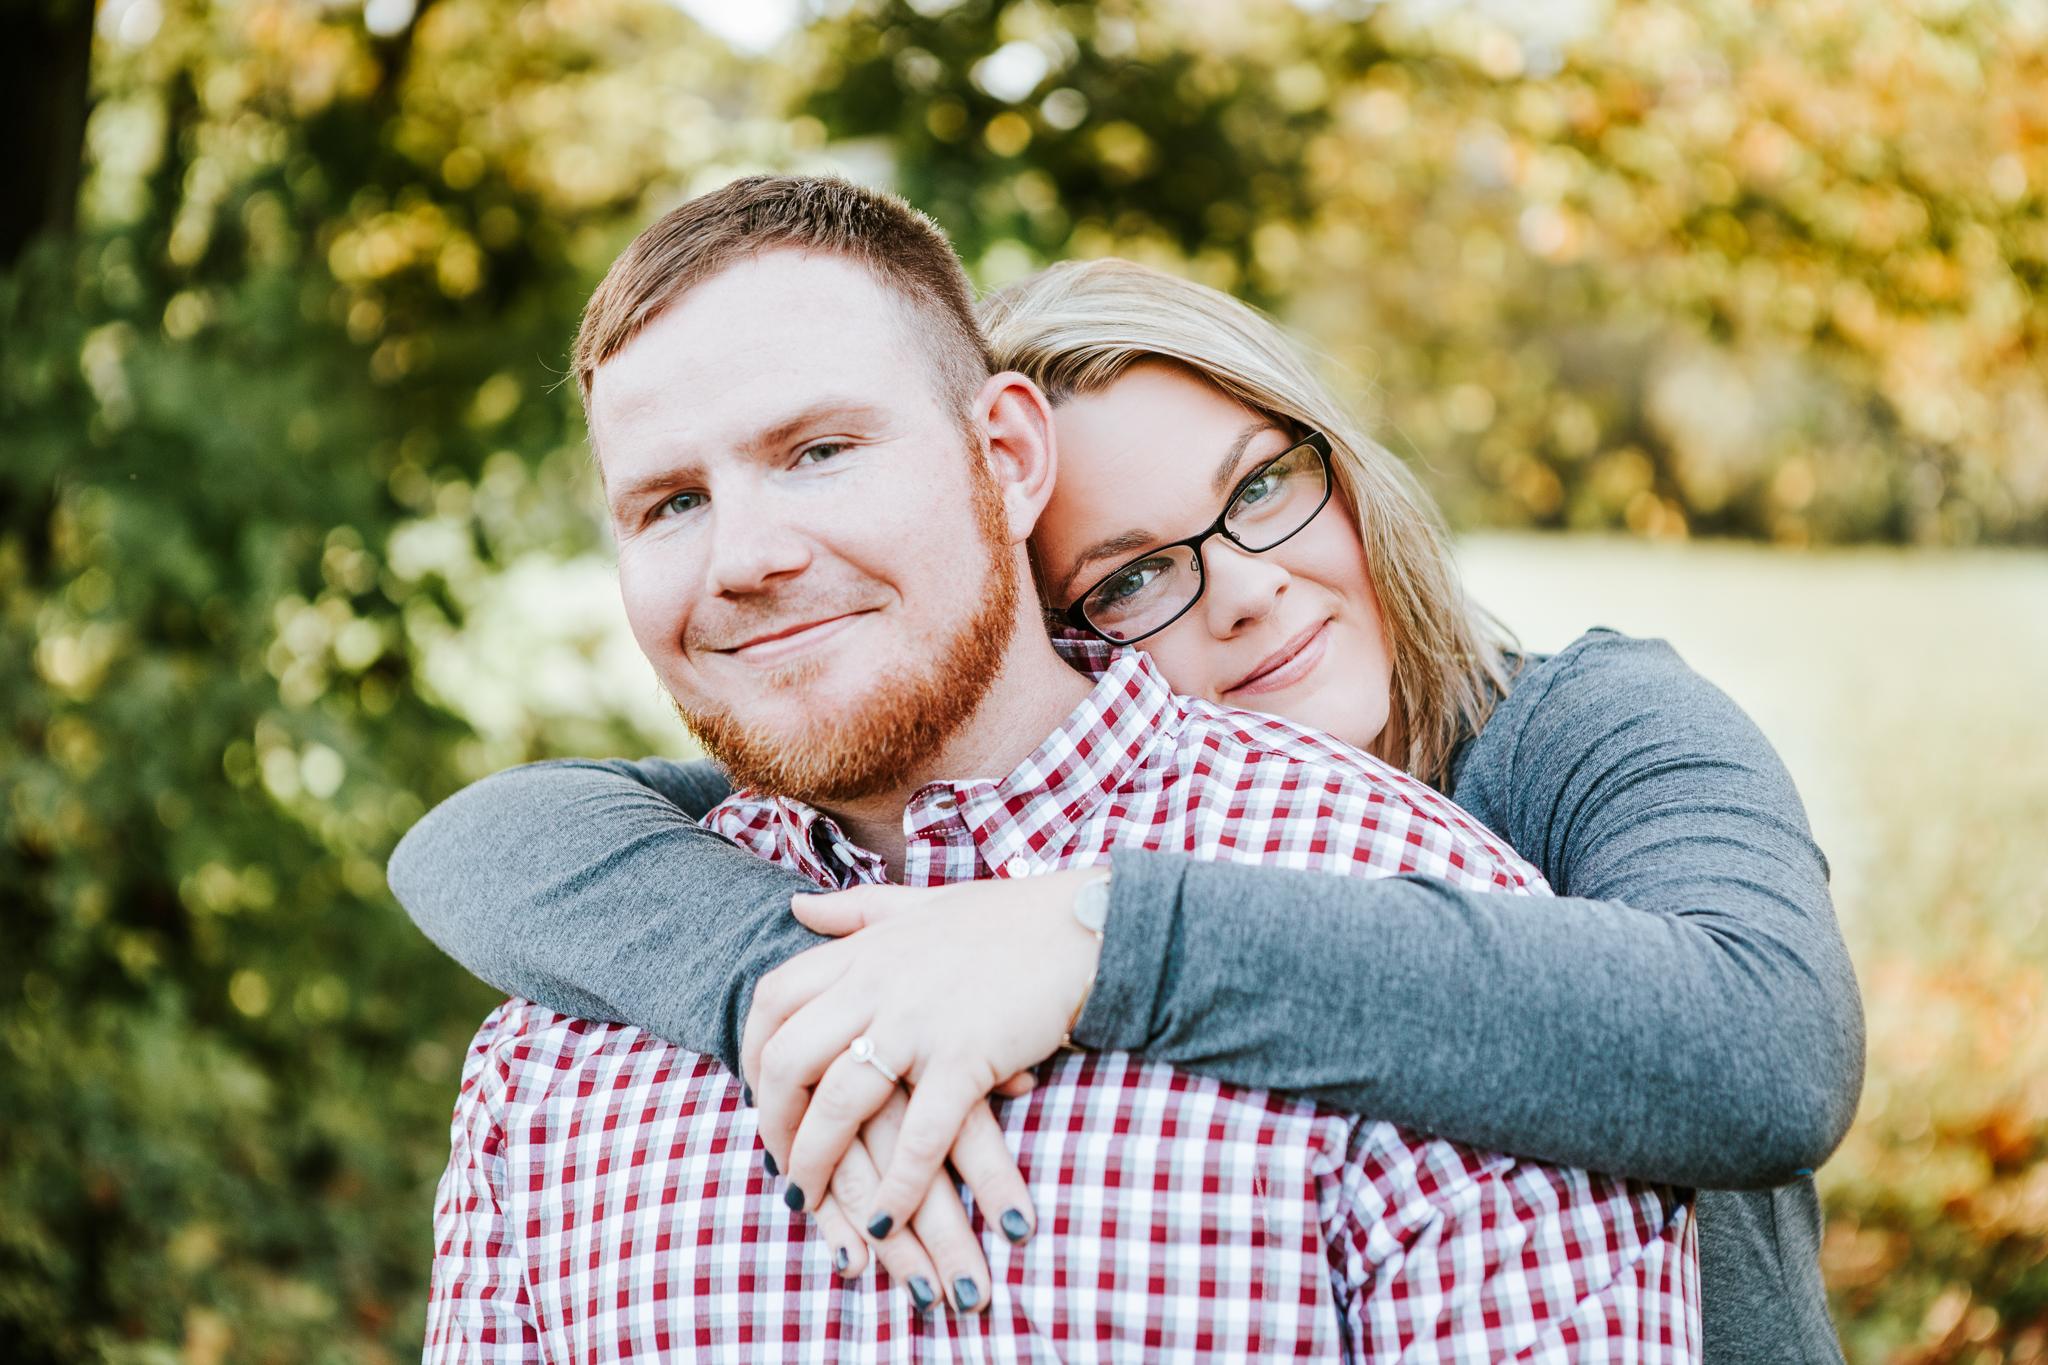 Richmond Kentucky Engagement Photographer - Ariana Jordan Photography -14.jpg